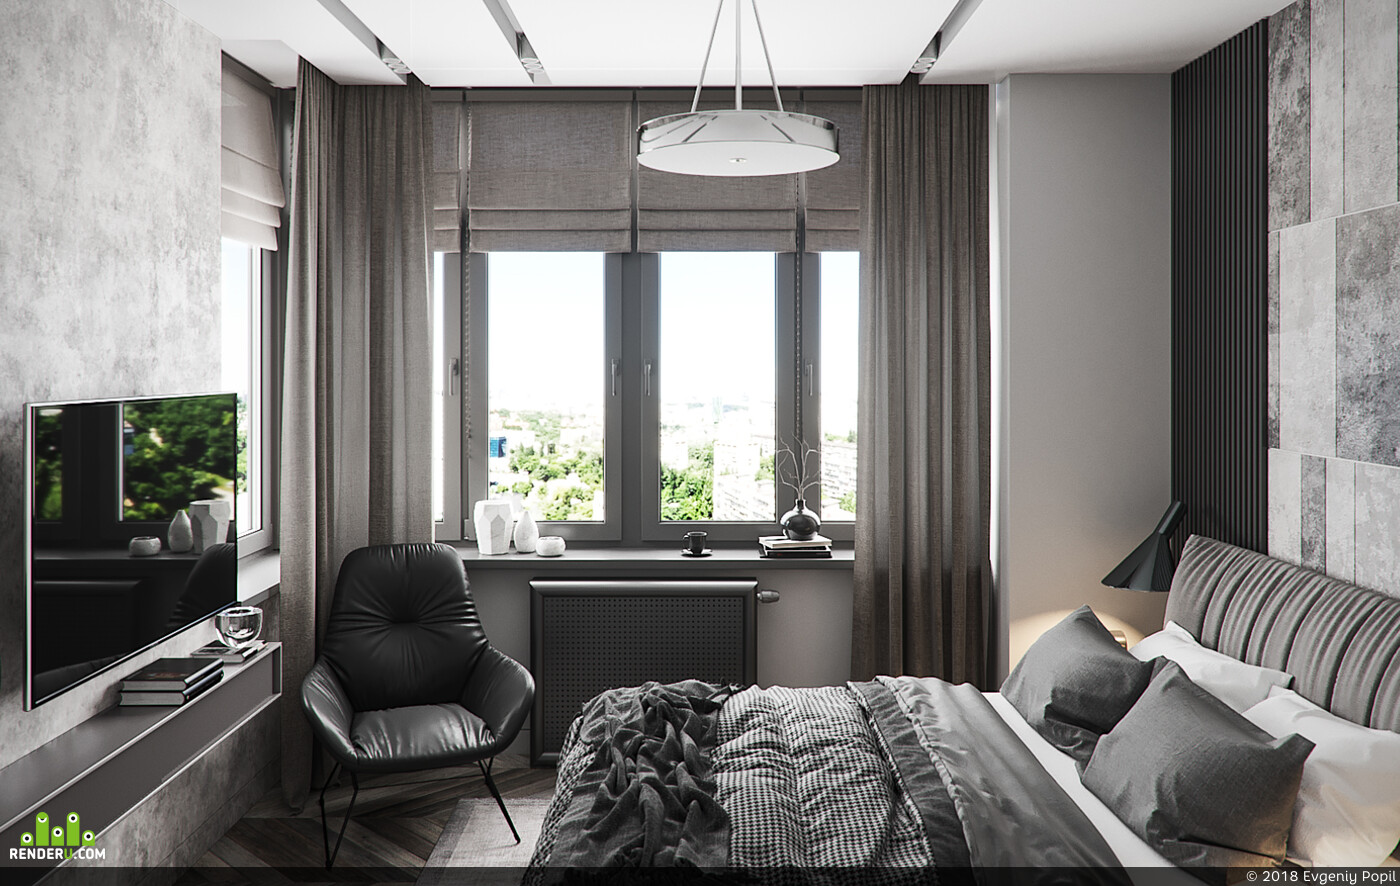 кухня, гостиная, гардеробная, Спальня, санузел